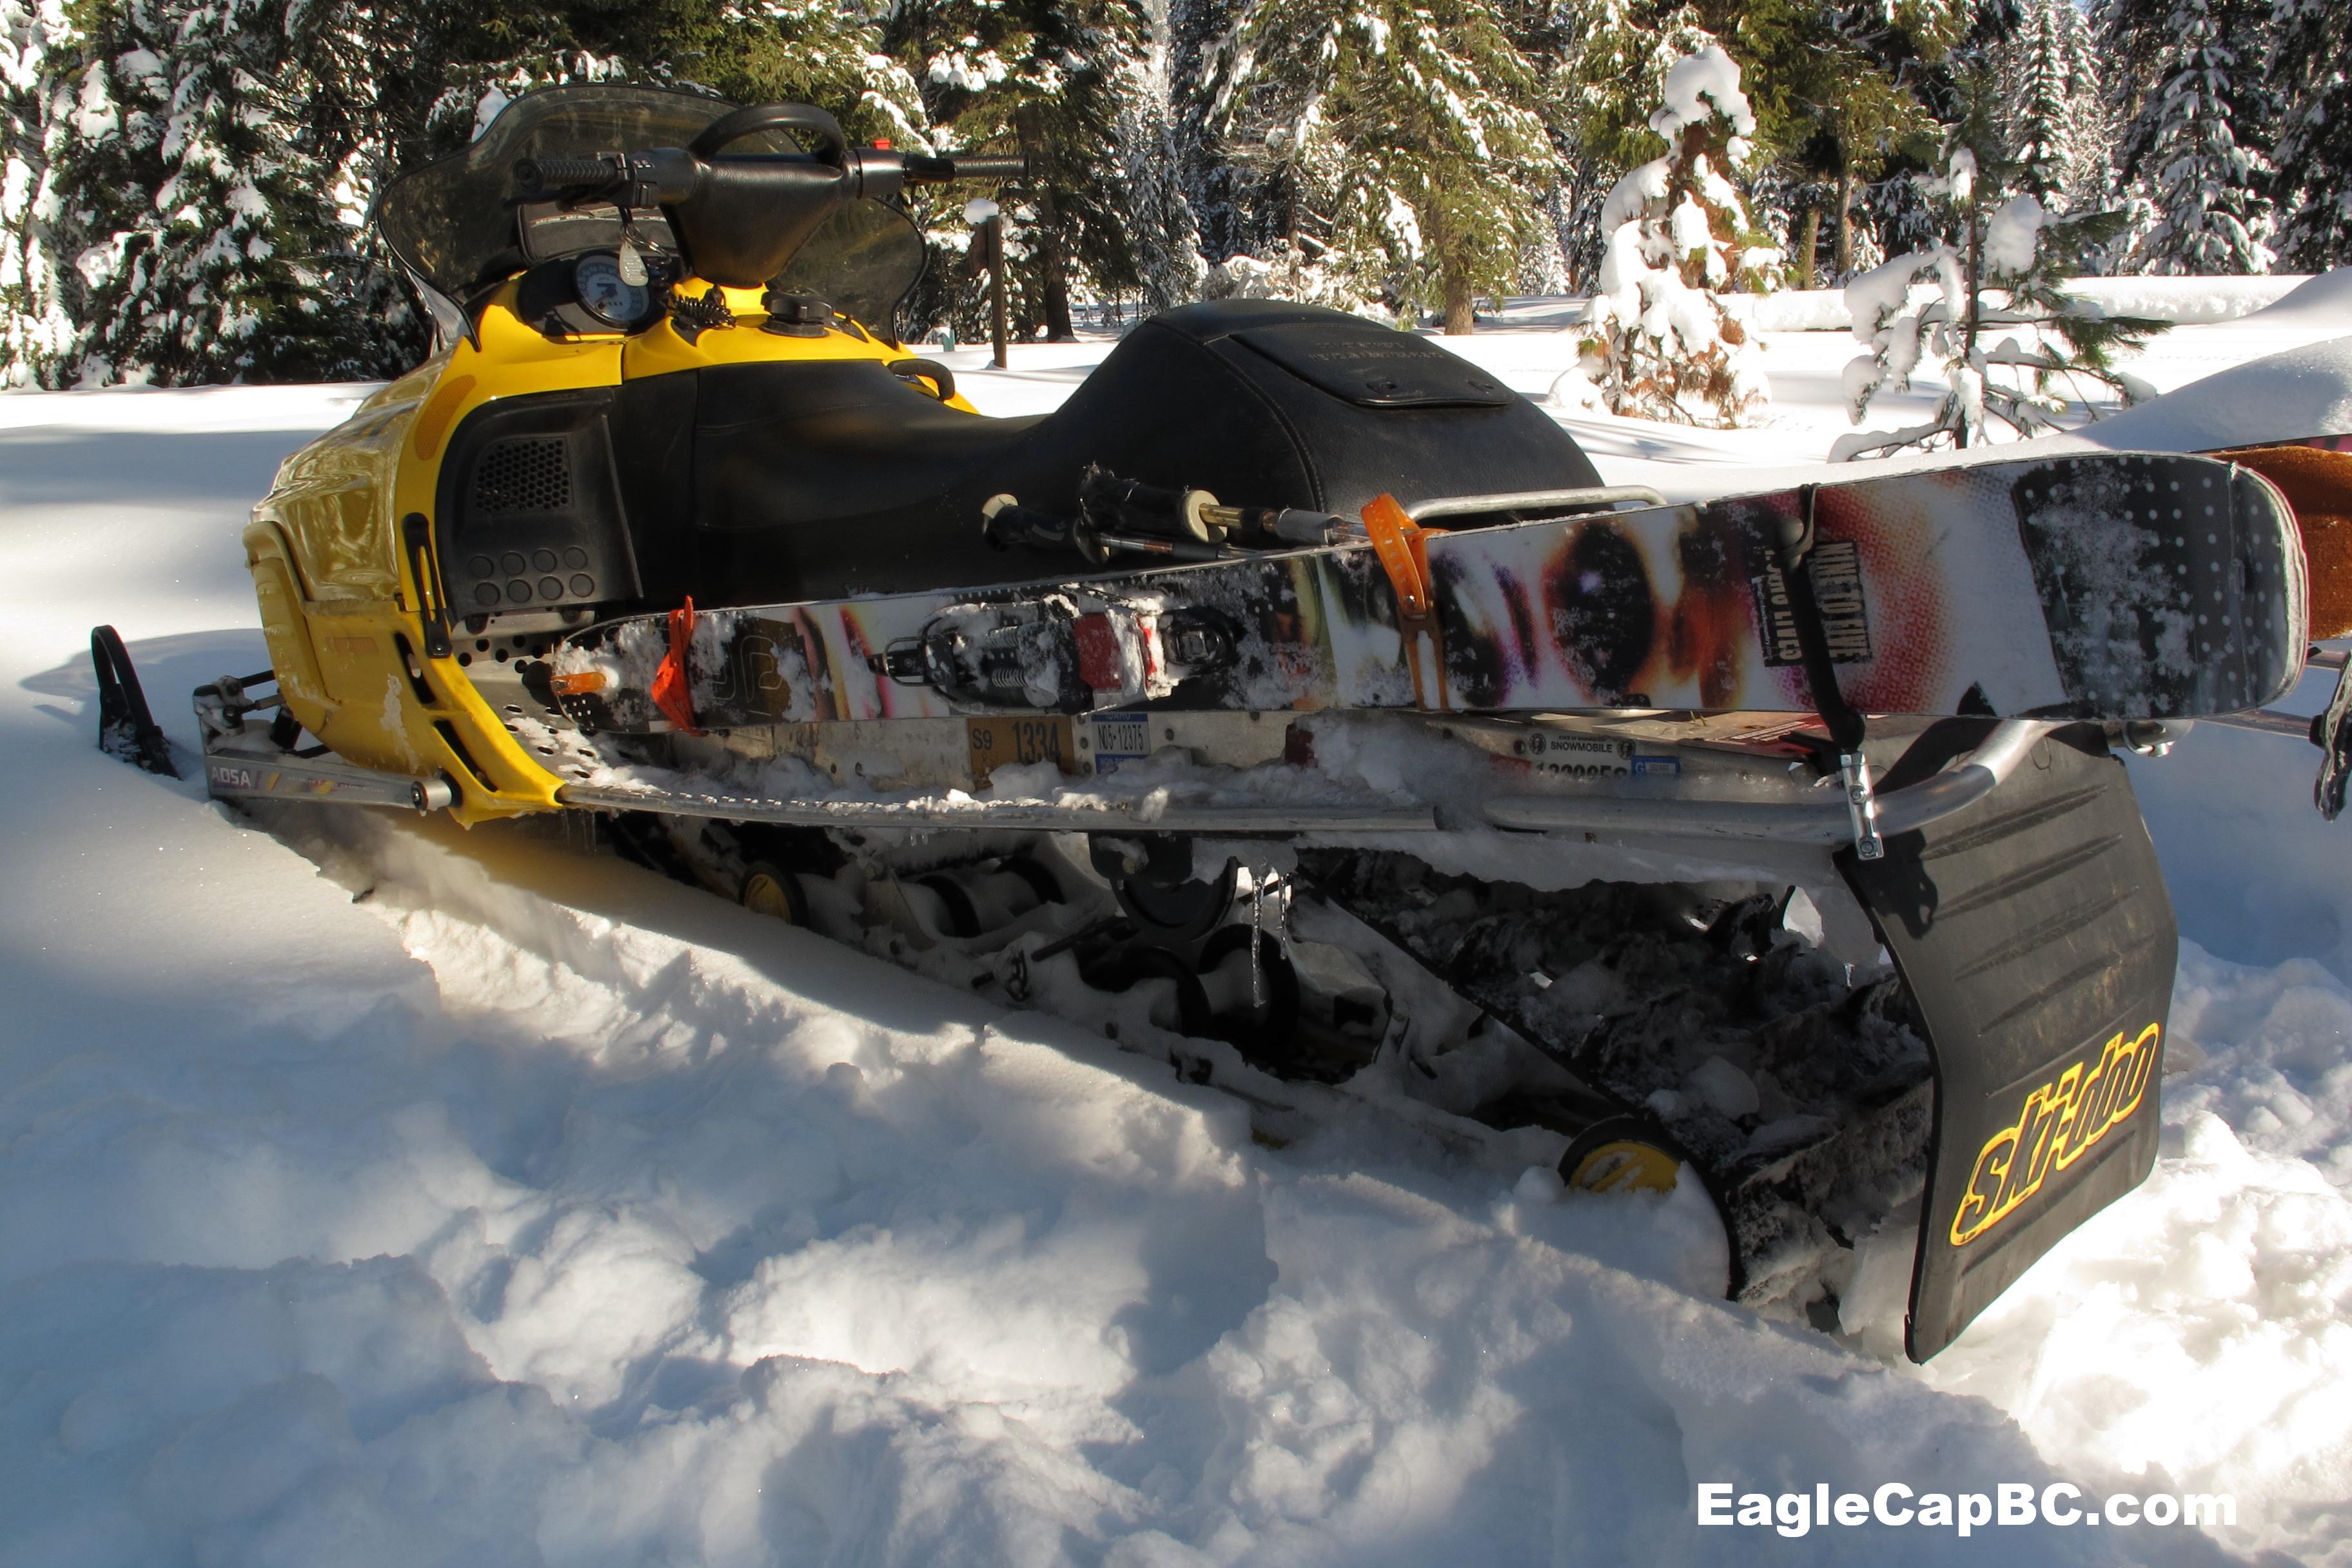 Snowmobile Ski Carry Eagle Cap Backcountry